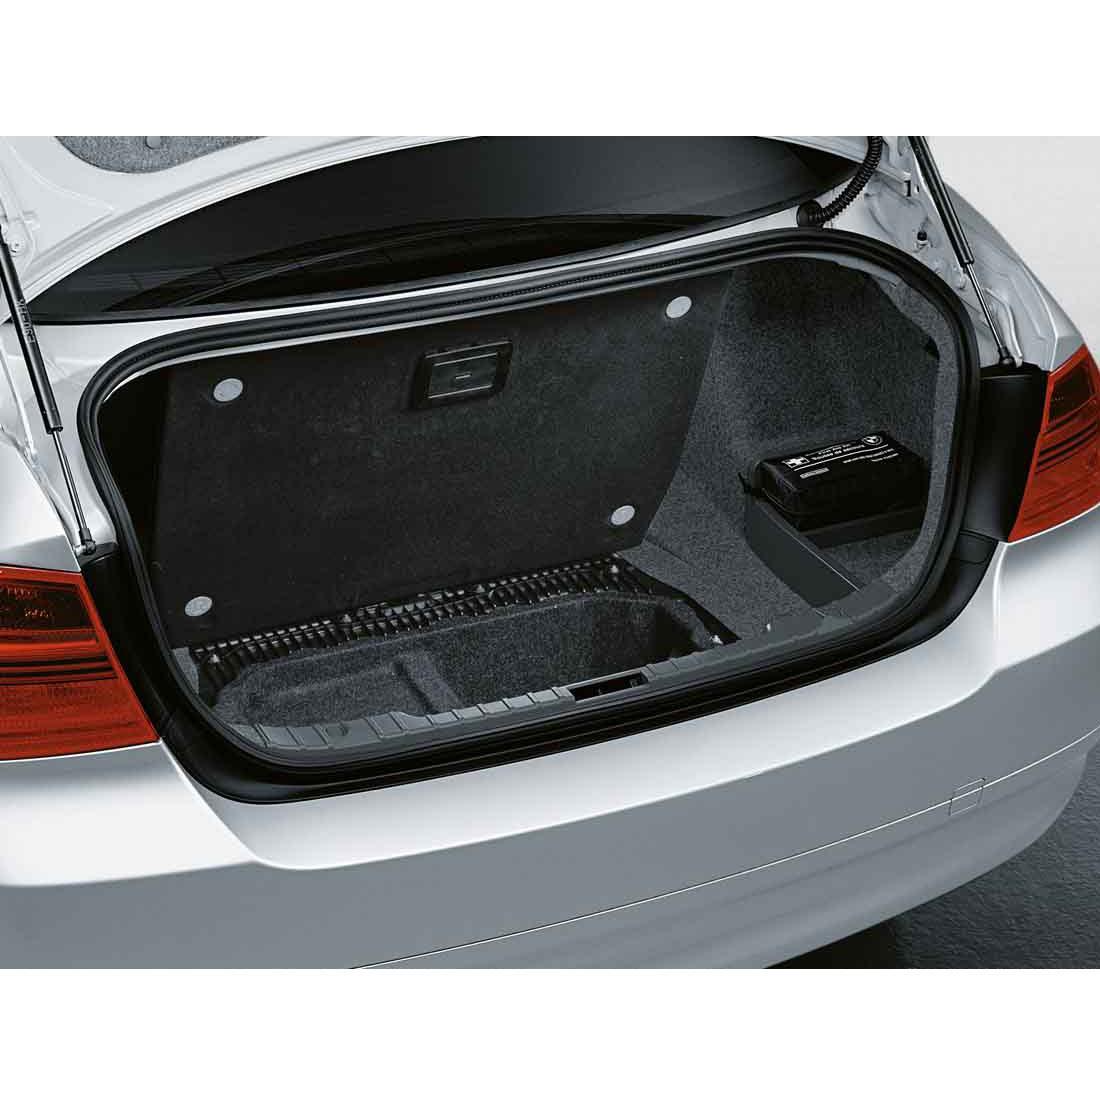 BMW Segmented Storage Compartment